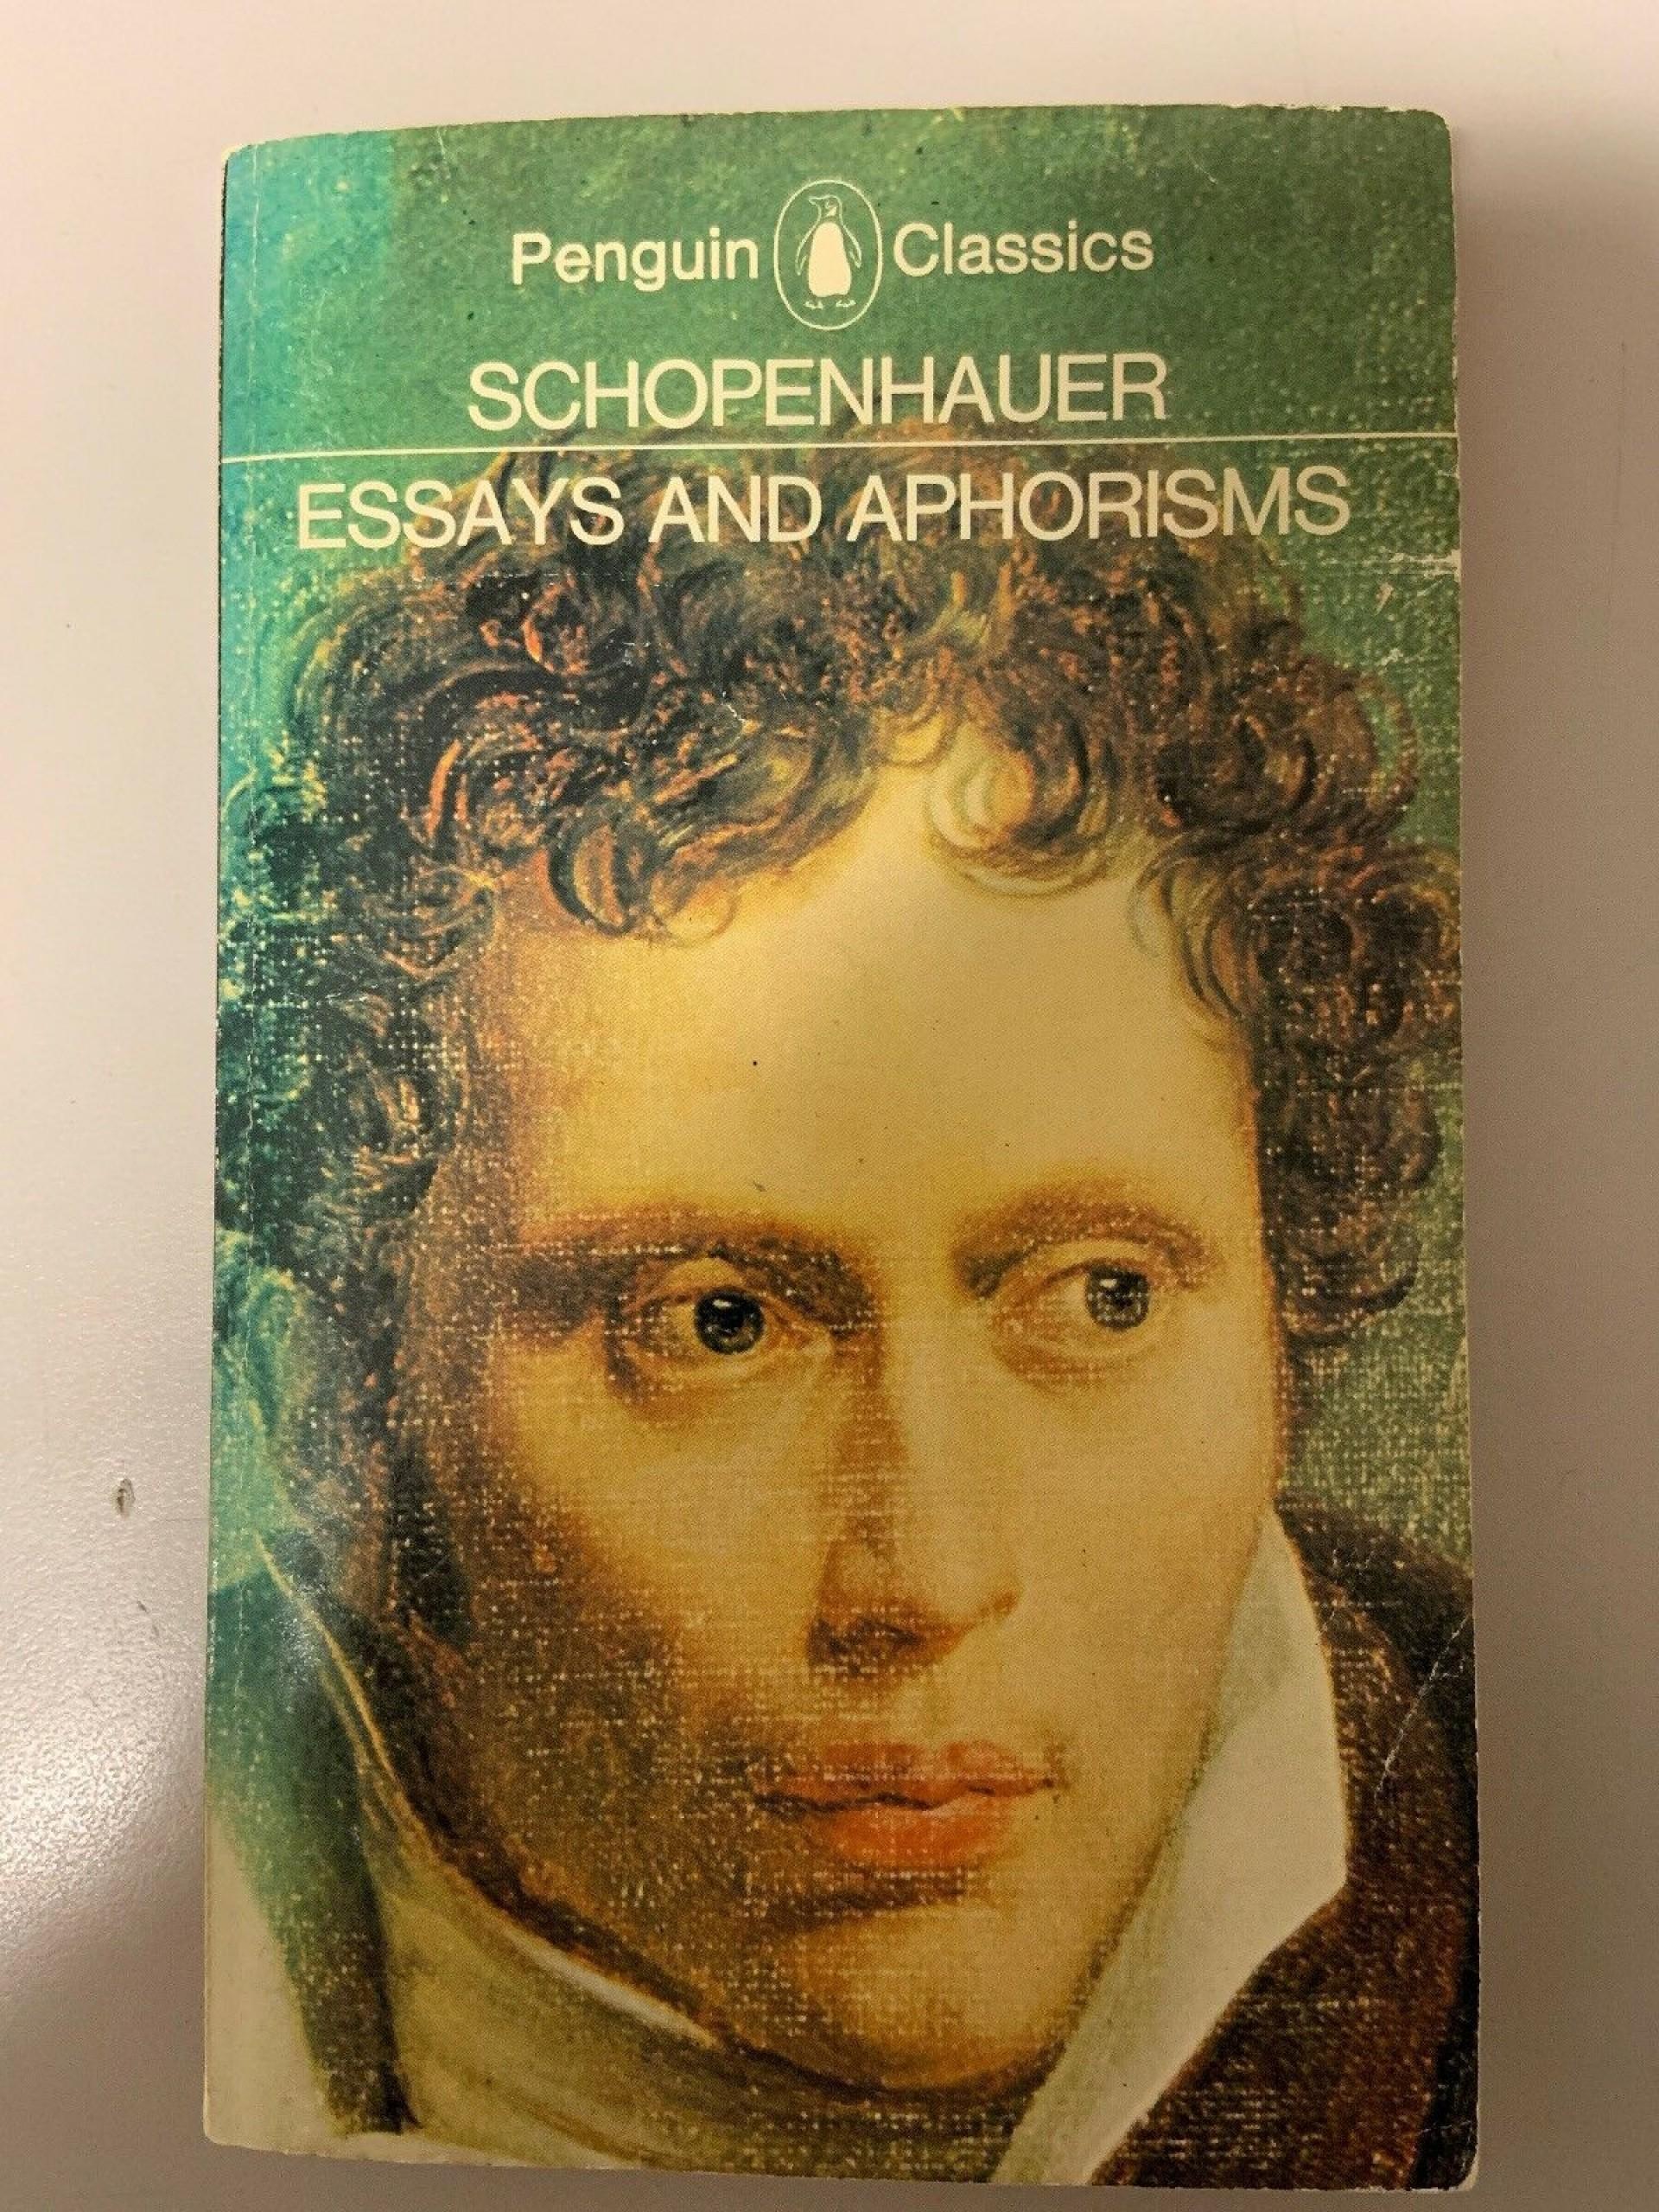 006 S L1600 Essays And Aphorisms Essay Frightening Pdf Schopenhauer 1920